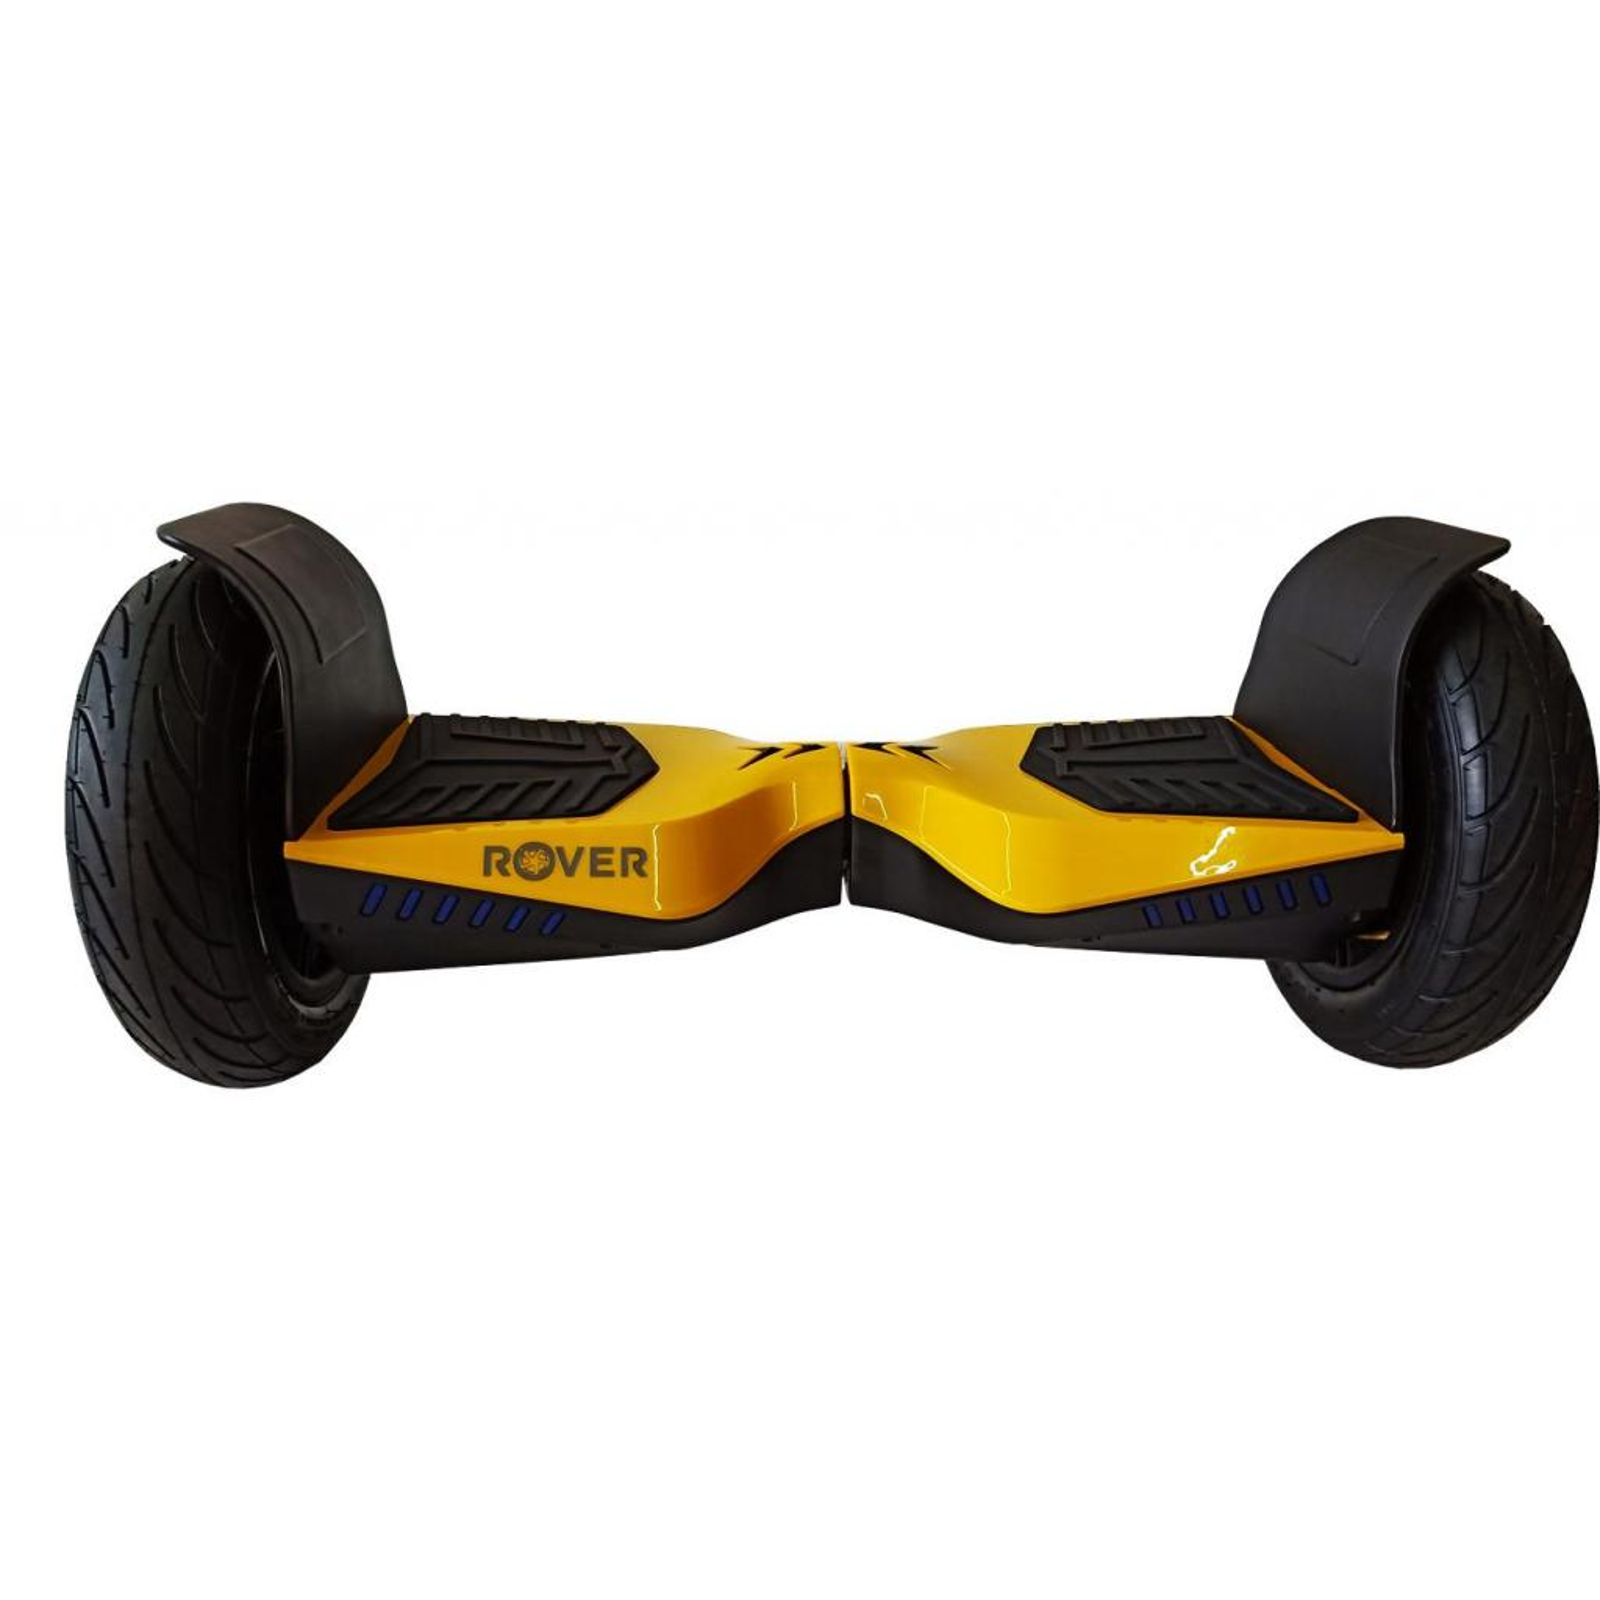 Гироборд Rover XL7 black-yellow изображение 2